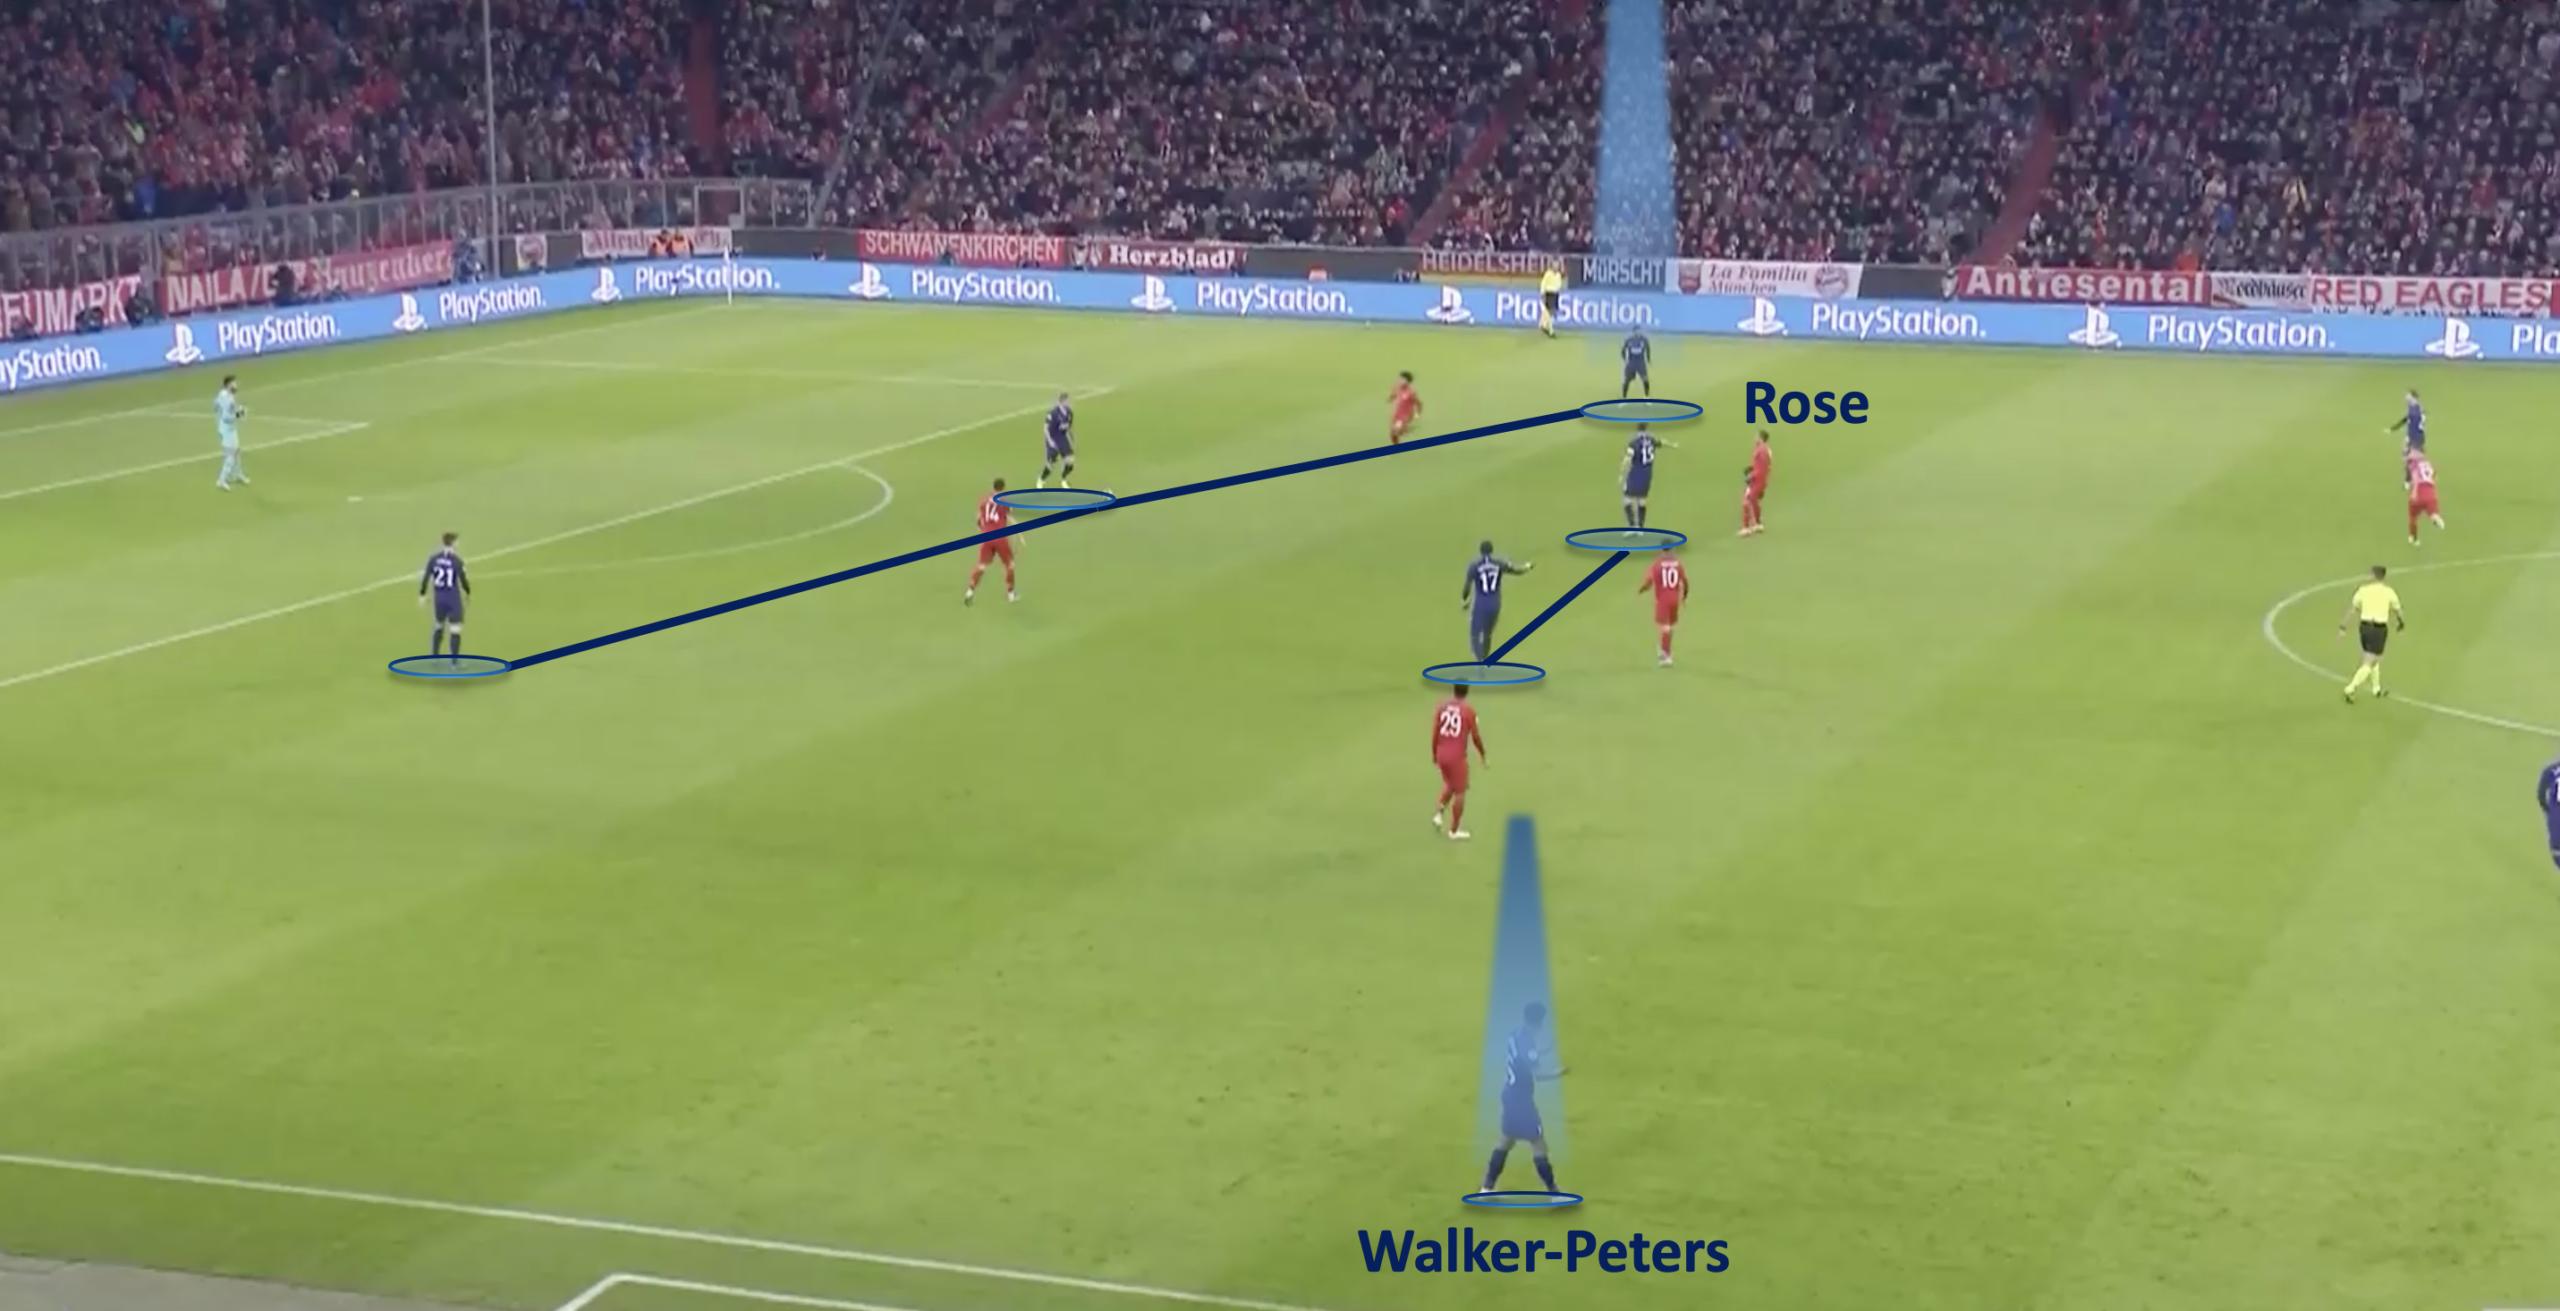 UEFA Champions League 2019:20: Bayern Munchen vs Tottenham Hotspur - tactical analysis tactics